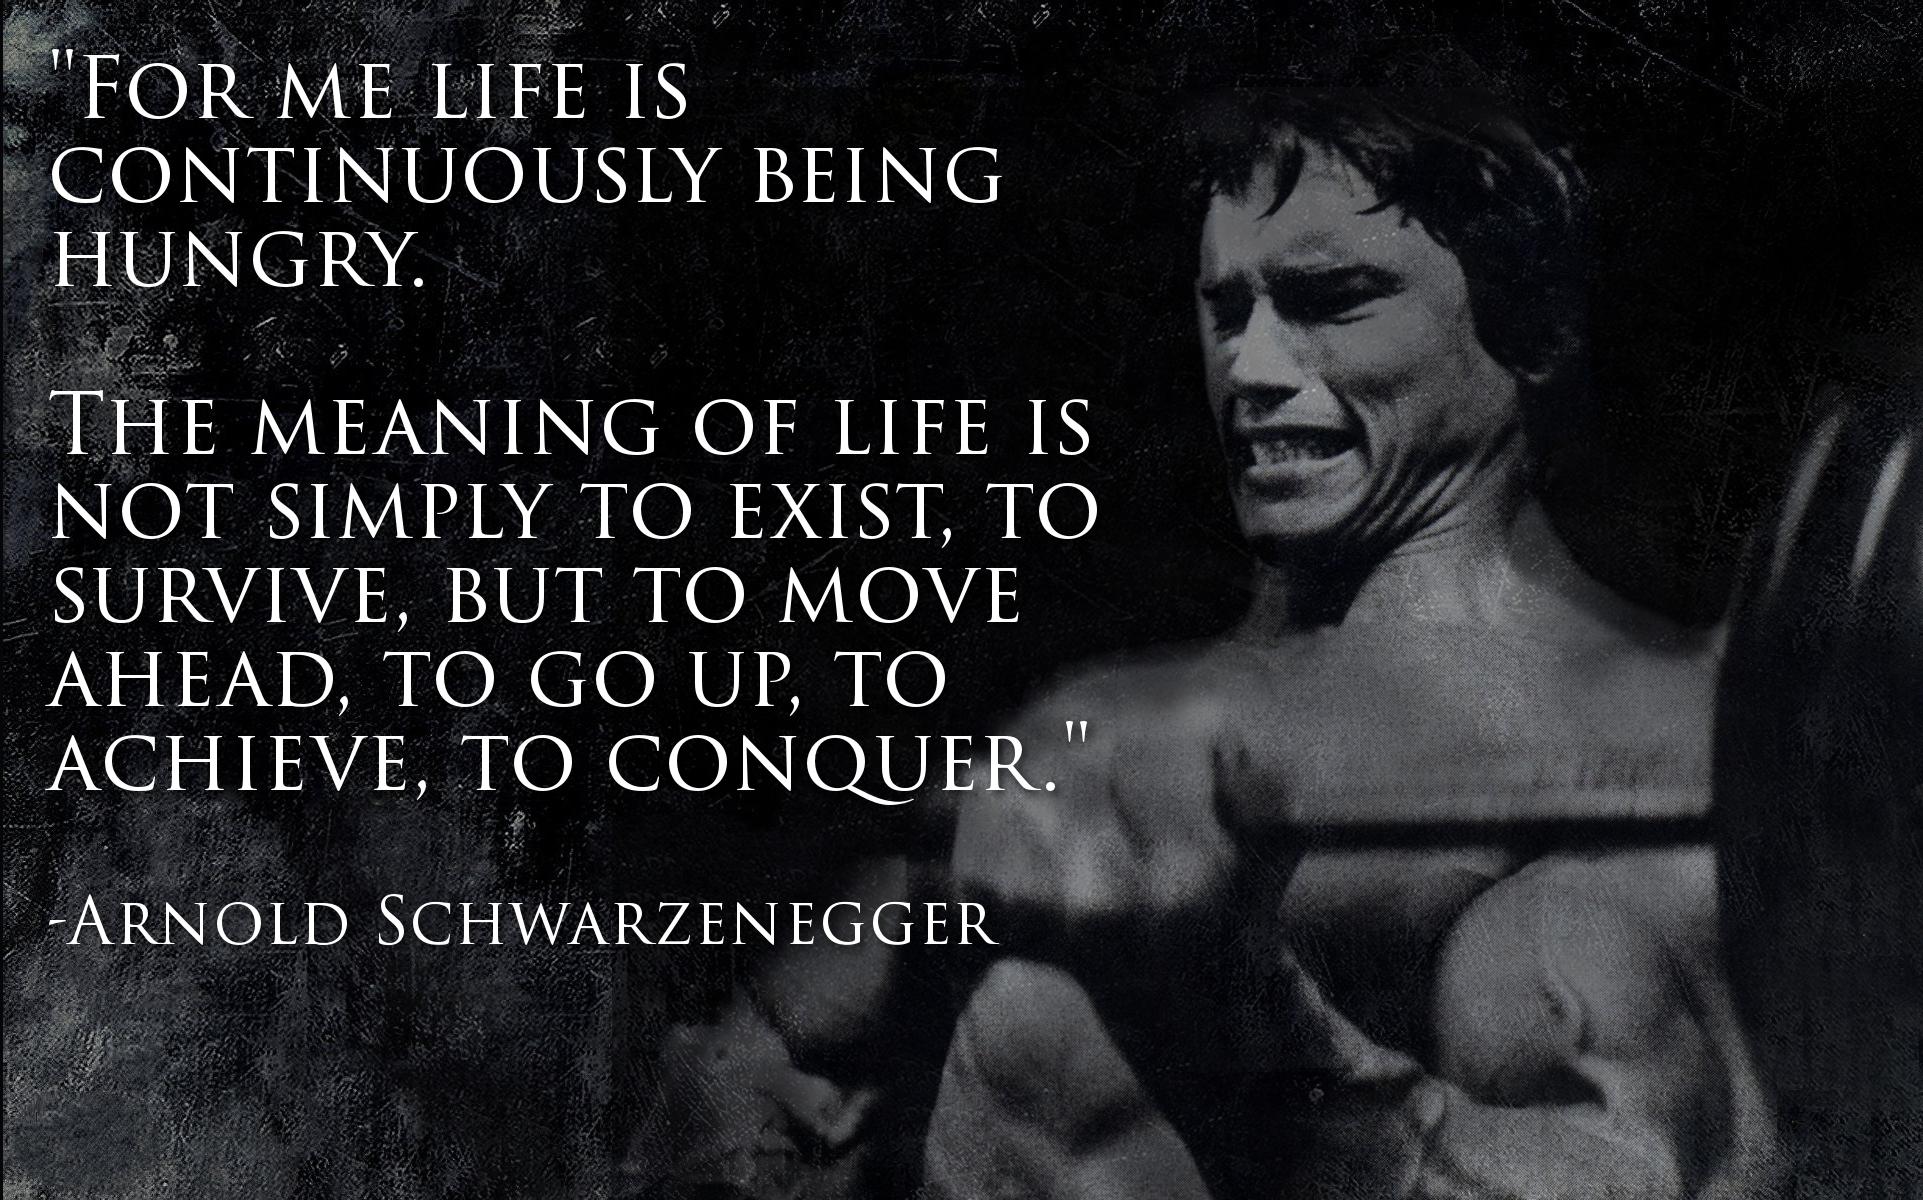 Arnold Schwarzenegger Fitness Quotes Quotesgram